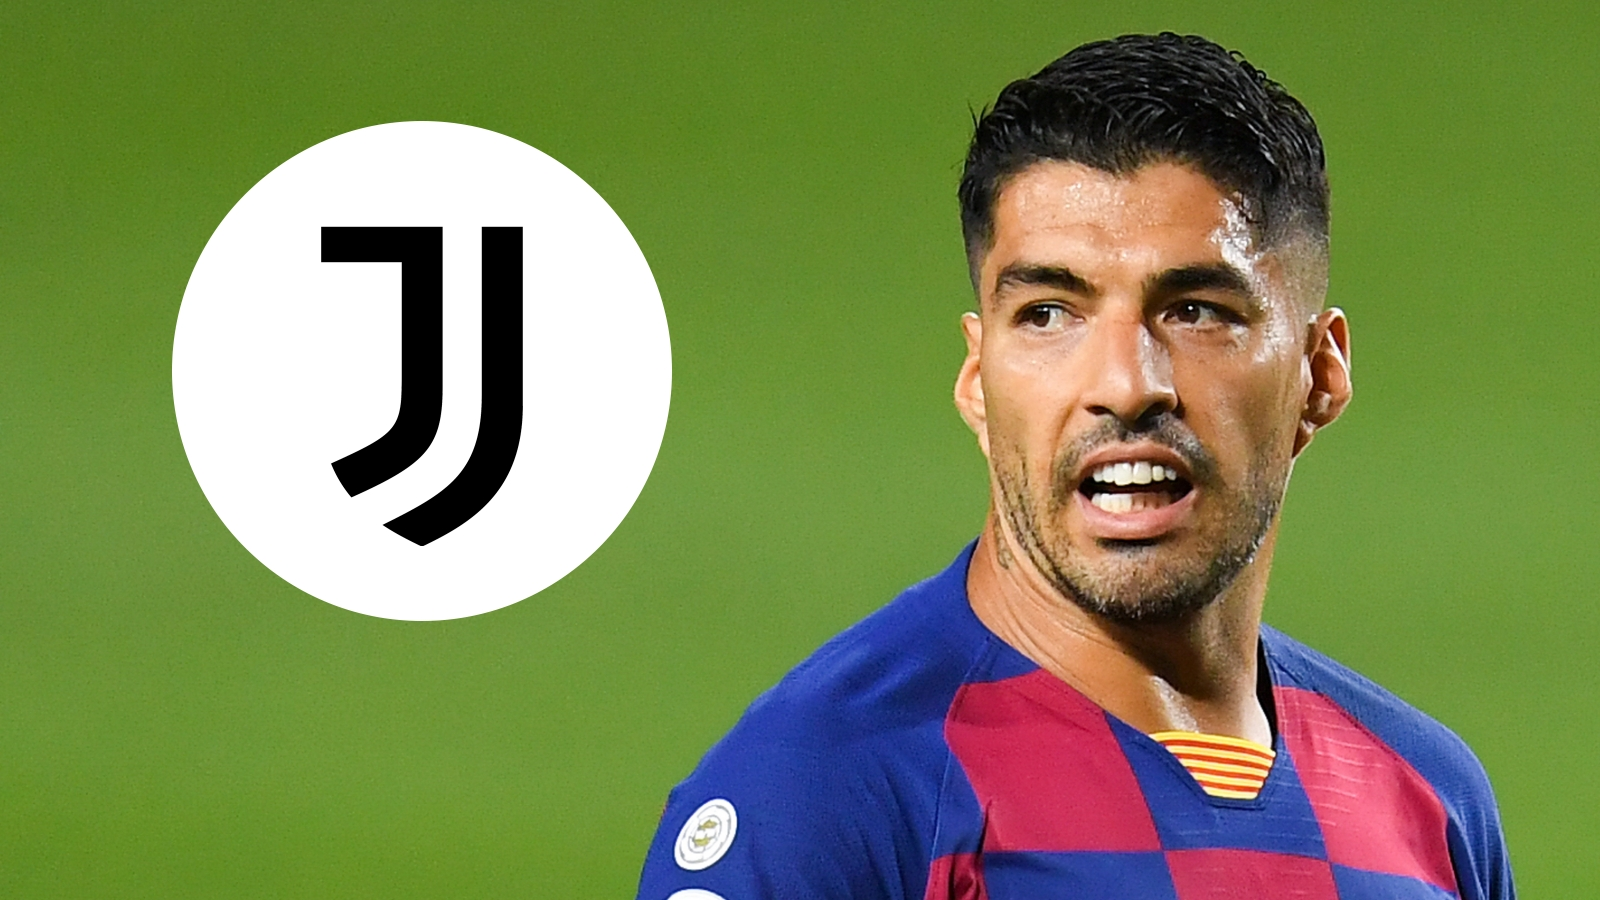 'Suarez has Juventus DNA & will thrive alongside Ronaldo' – Barcelona transfer talk no surprise to former director